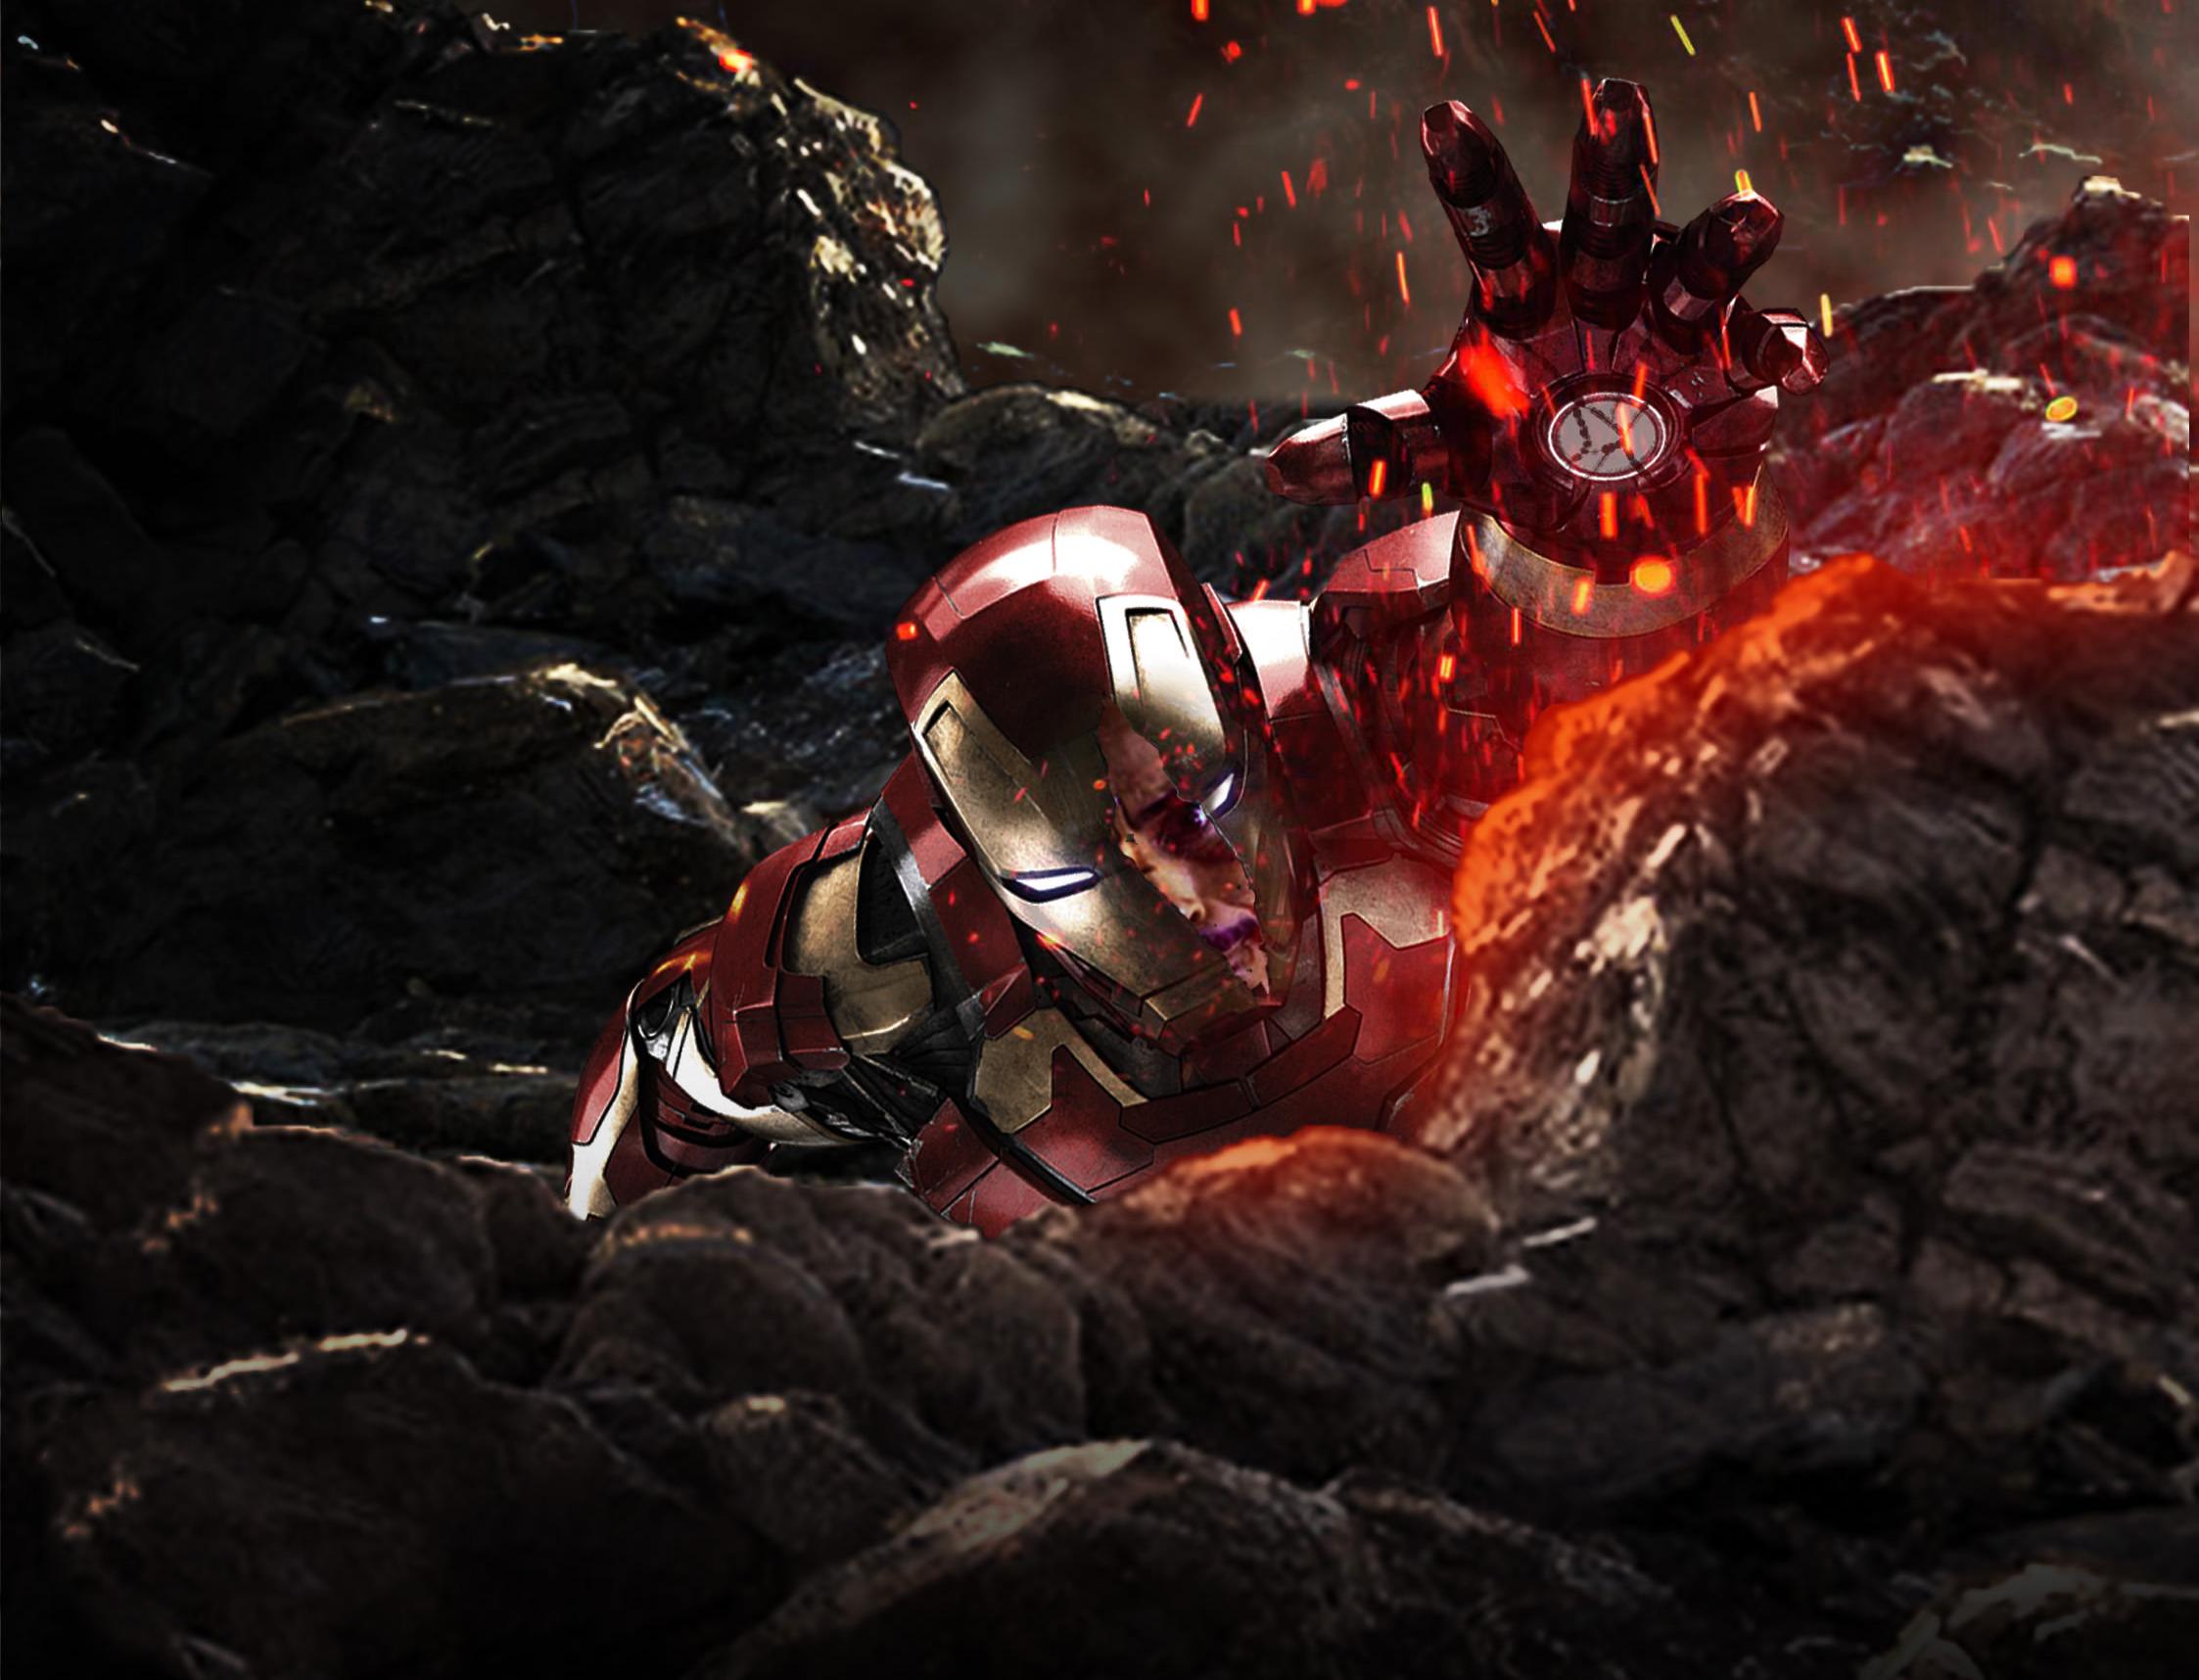 1920x1080 iron man in avengers infinity war laptop full hd 1080p hd